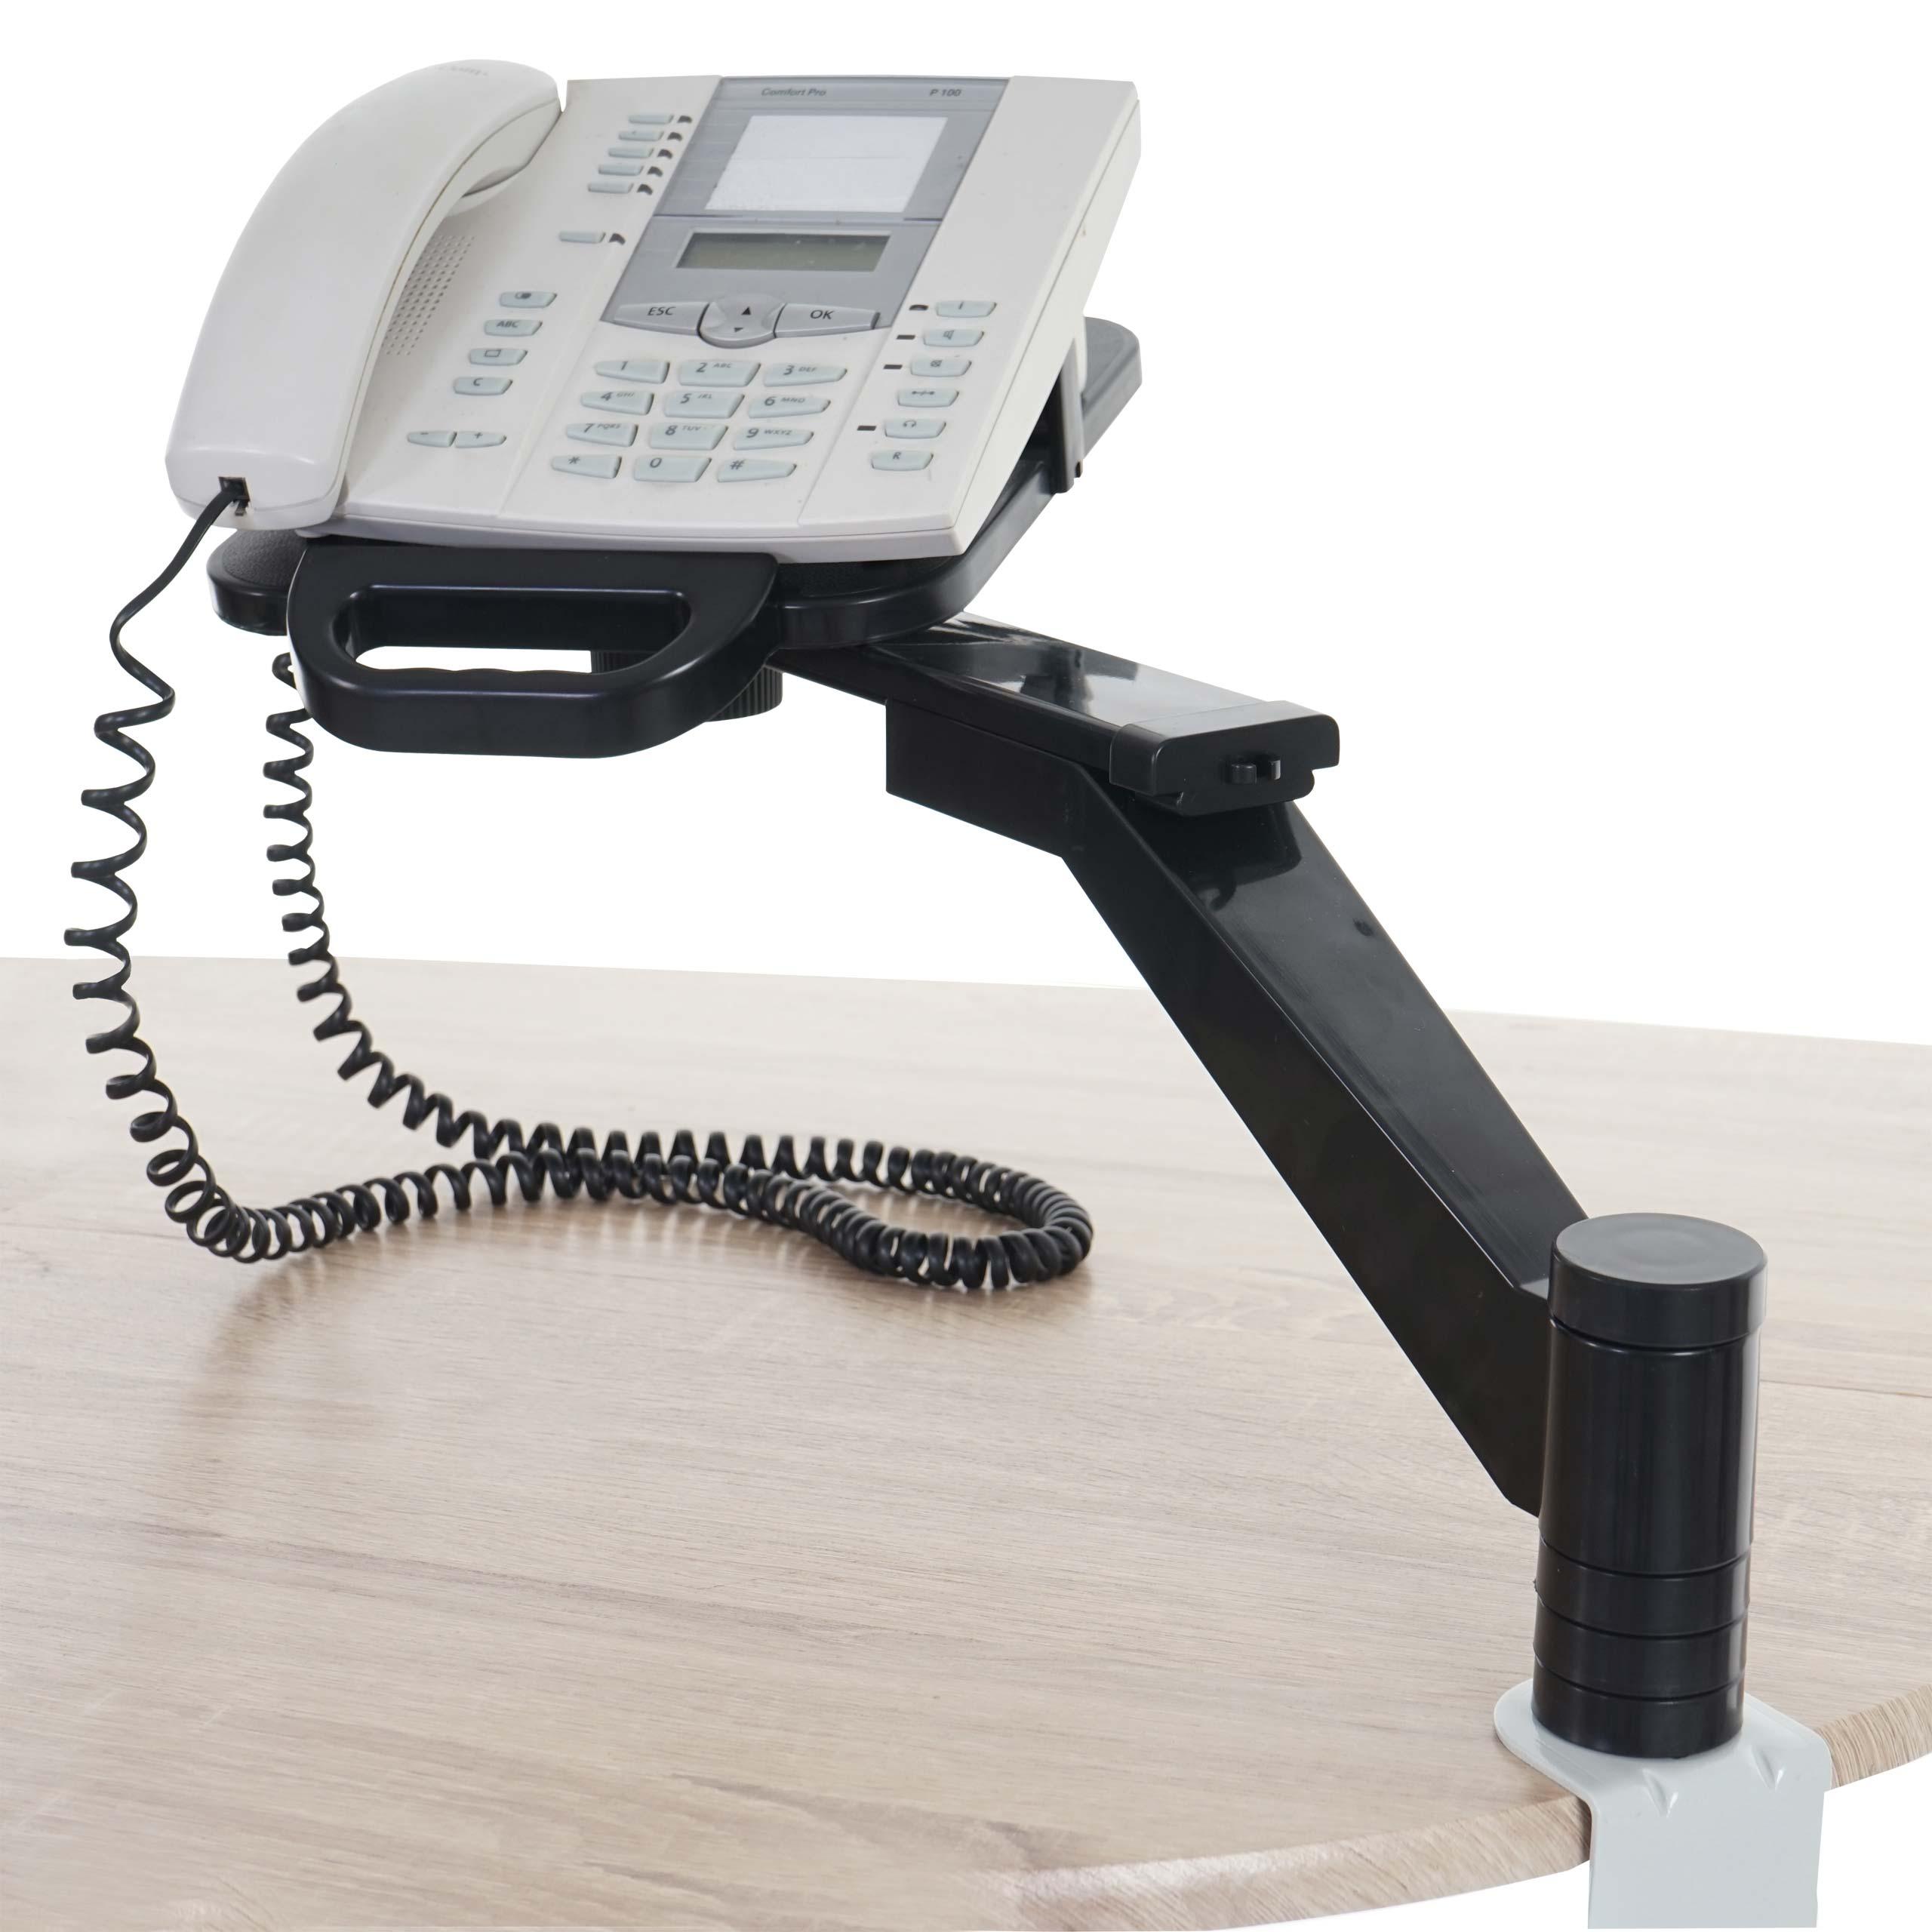 Mendler Telefonarm T555, Telefonhalter Telefonschwenkarm Tischhalterung ~ Variantenangebot 45689